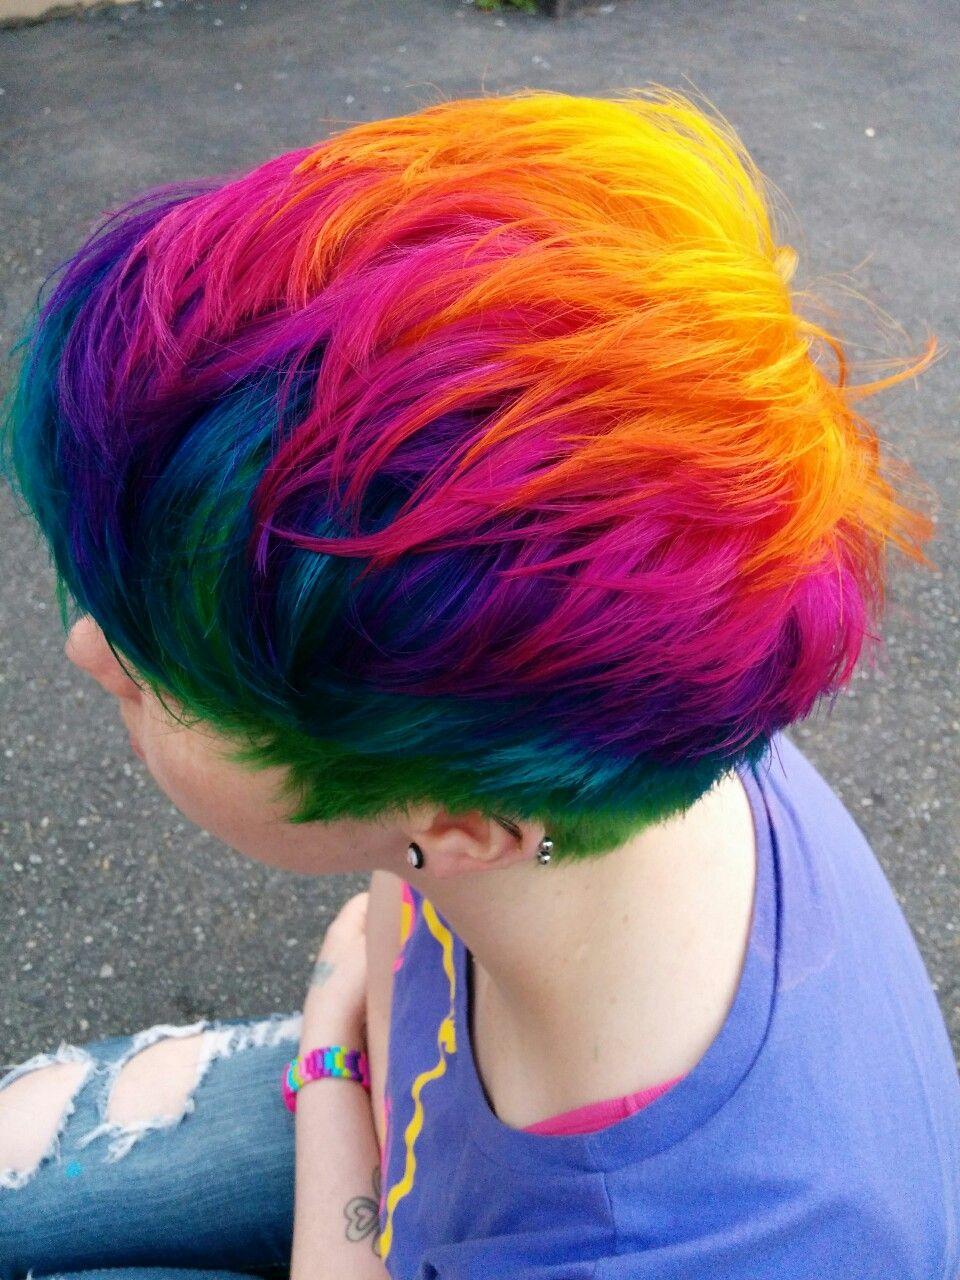 Rainbow Hair Rainbows Red Blue Green Orange Yellow Purple Pink Short Rainbow Hair Hair Styles Bright Hair